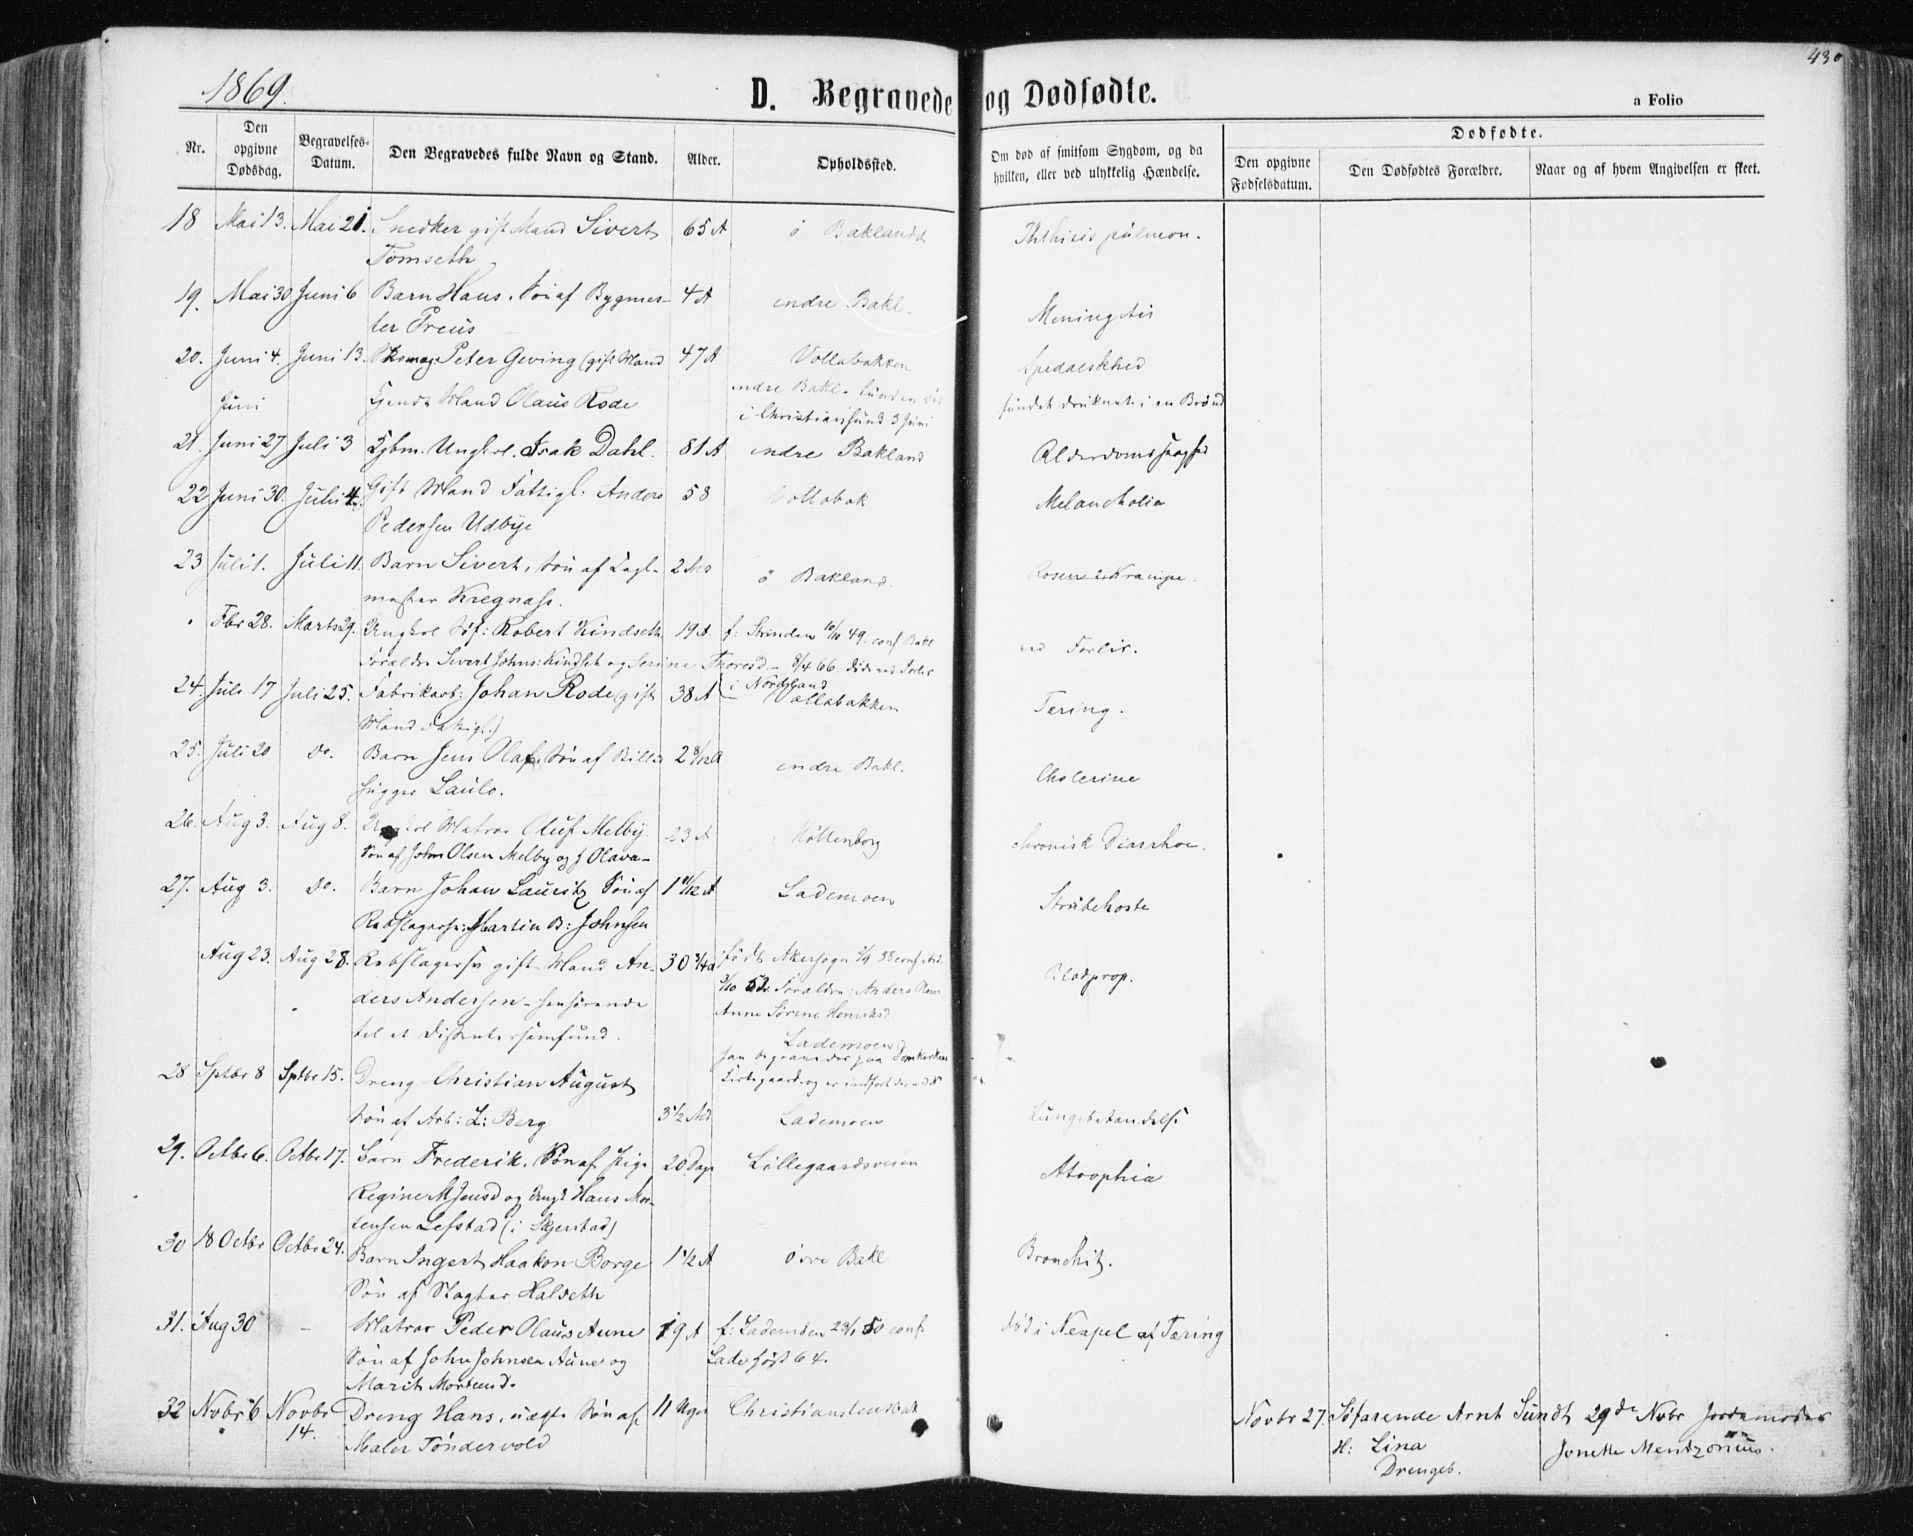 SAT, Ministerialprotokoller, klokkerbøker og fødselsregistre - Sør-Trøndelag, 604/L0186: Parish register (official) no. 604A07, 1866-1877, p. 430